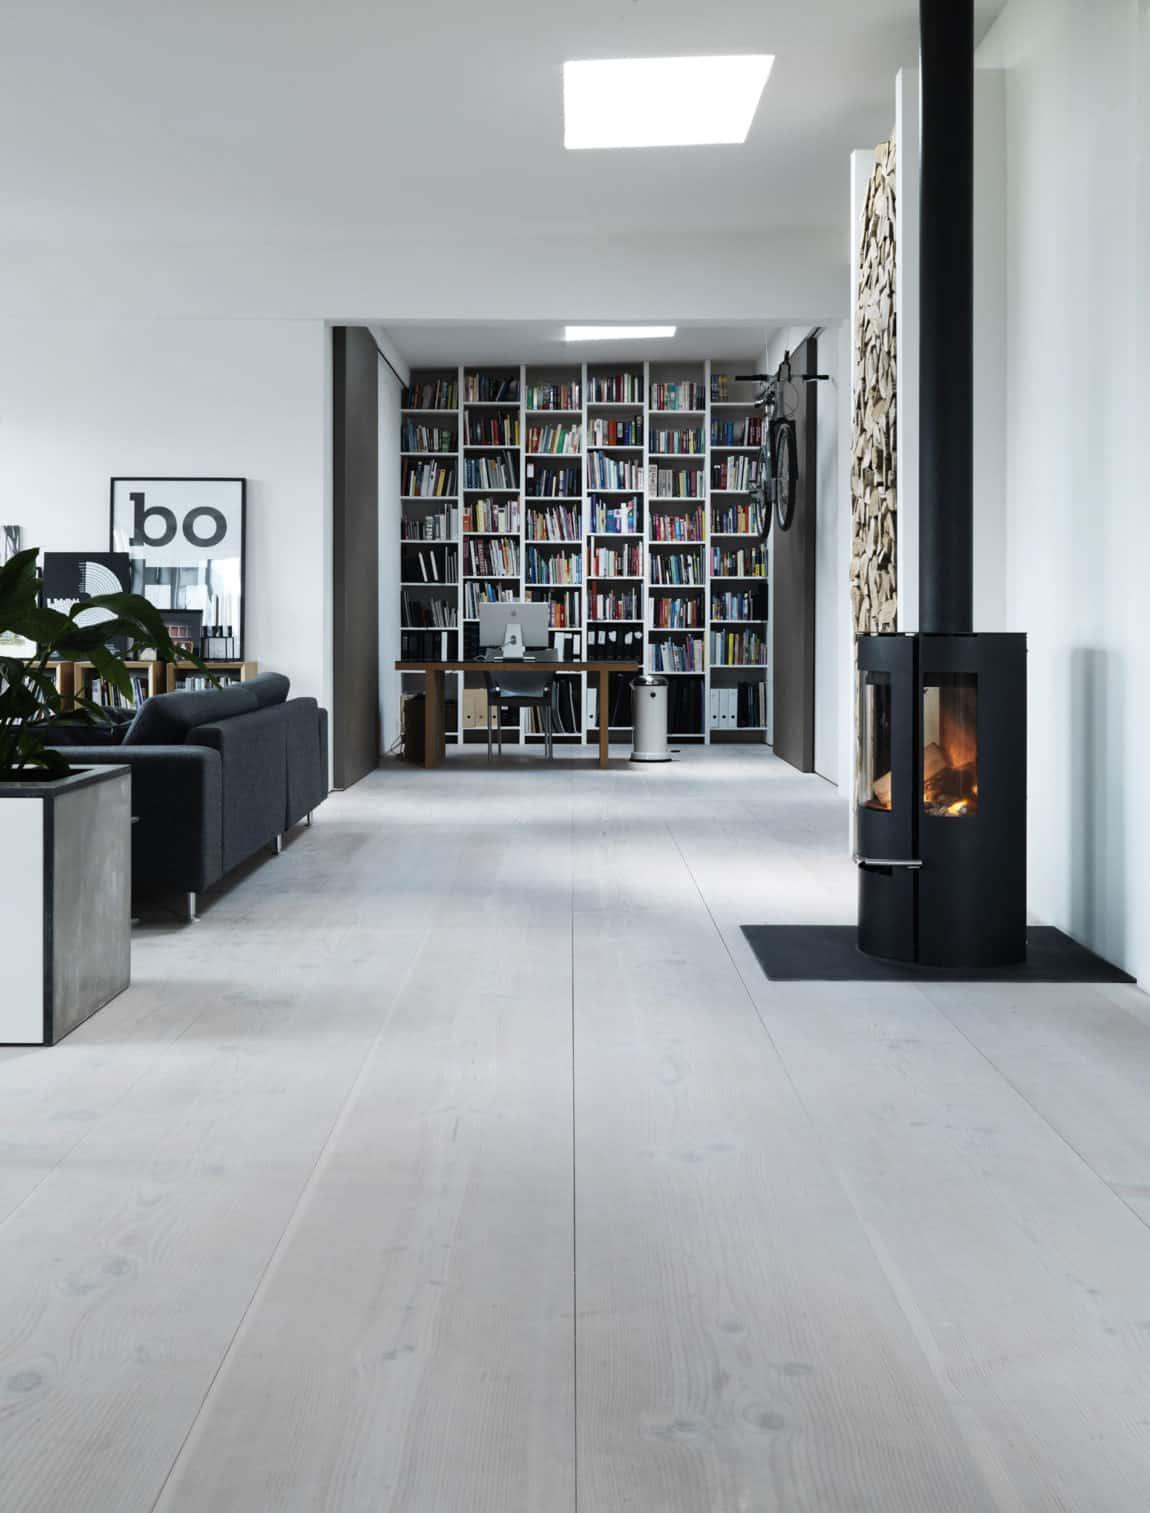 The Home of Morten Bo Jensen by Vipp (11)